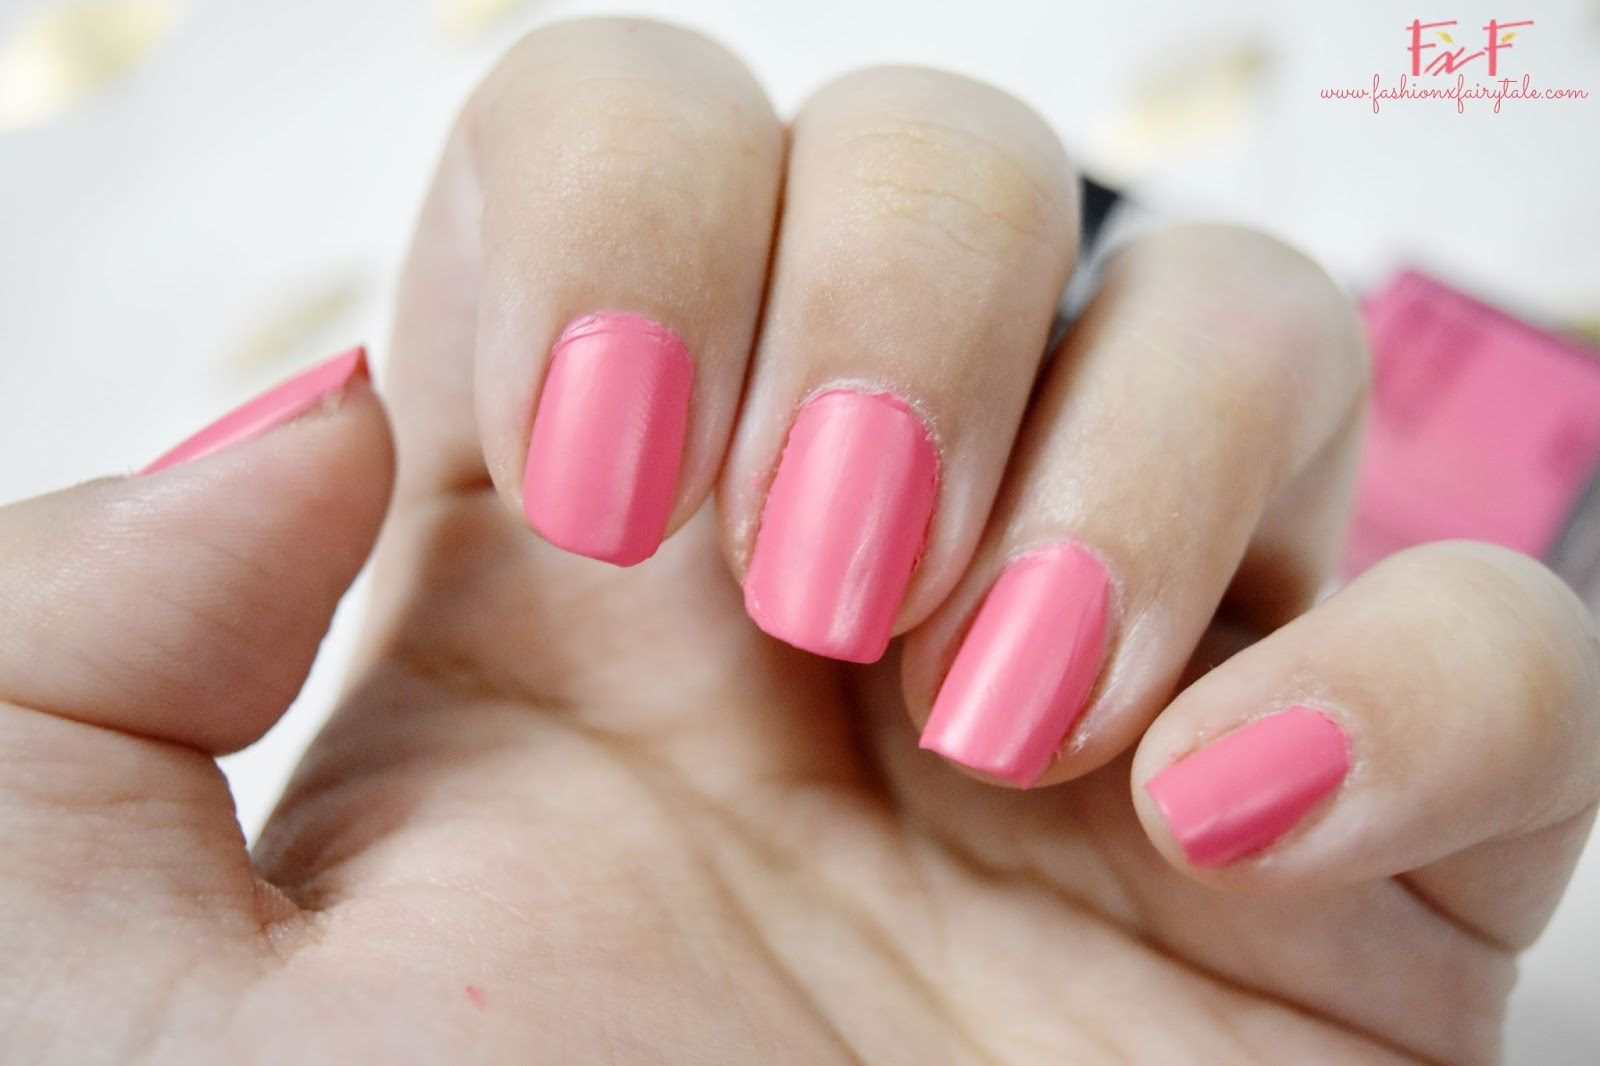 BYS Matte Pink Nail Polish Review - Fashion Fairytale